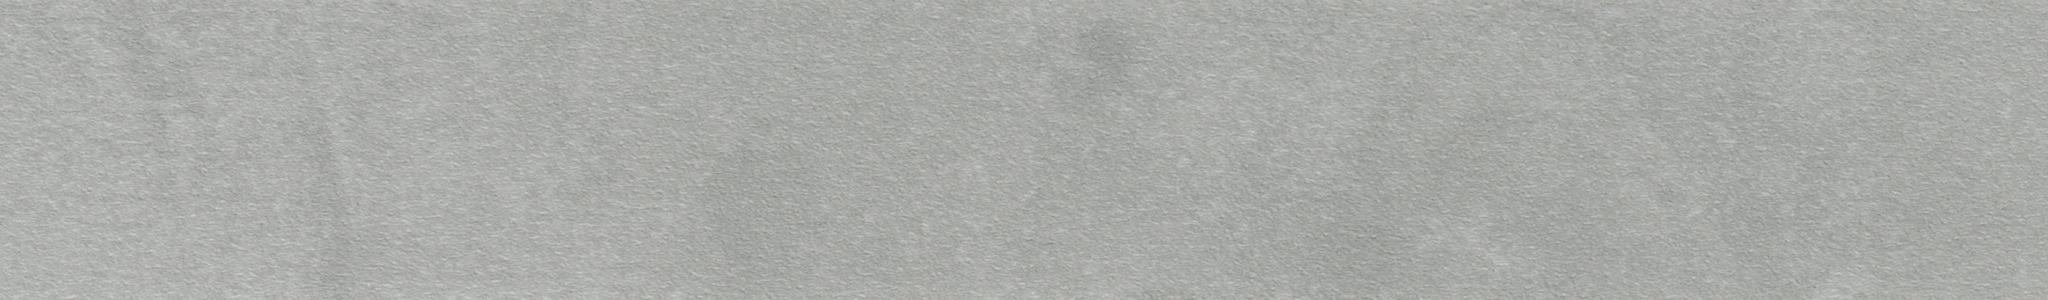 HD 290026 ABS Kante Dekor Alugrau Prado perl